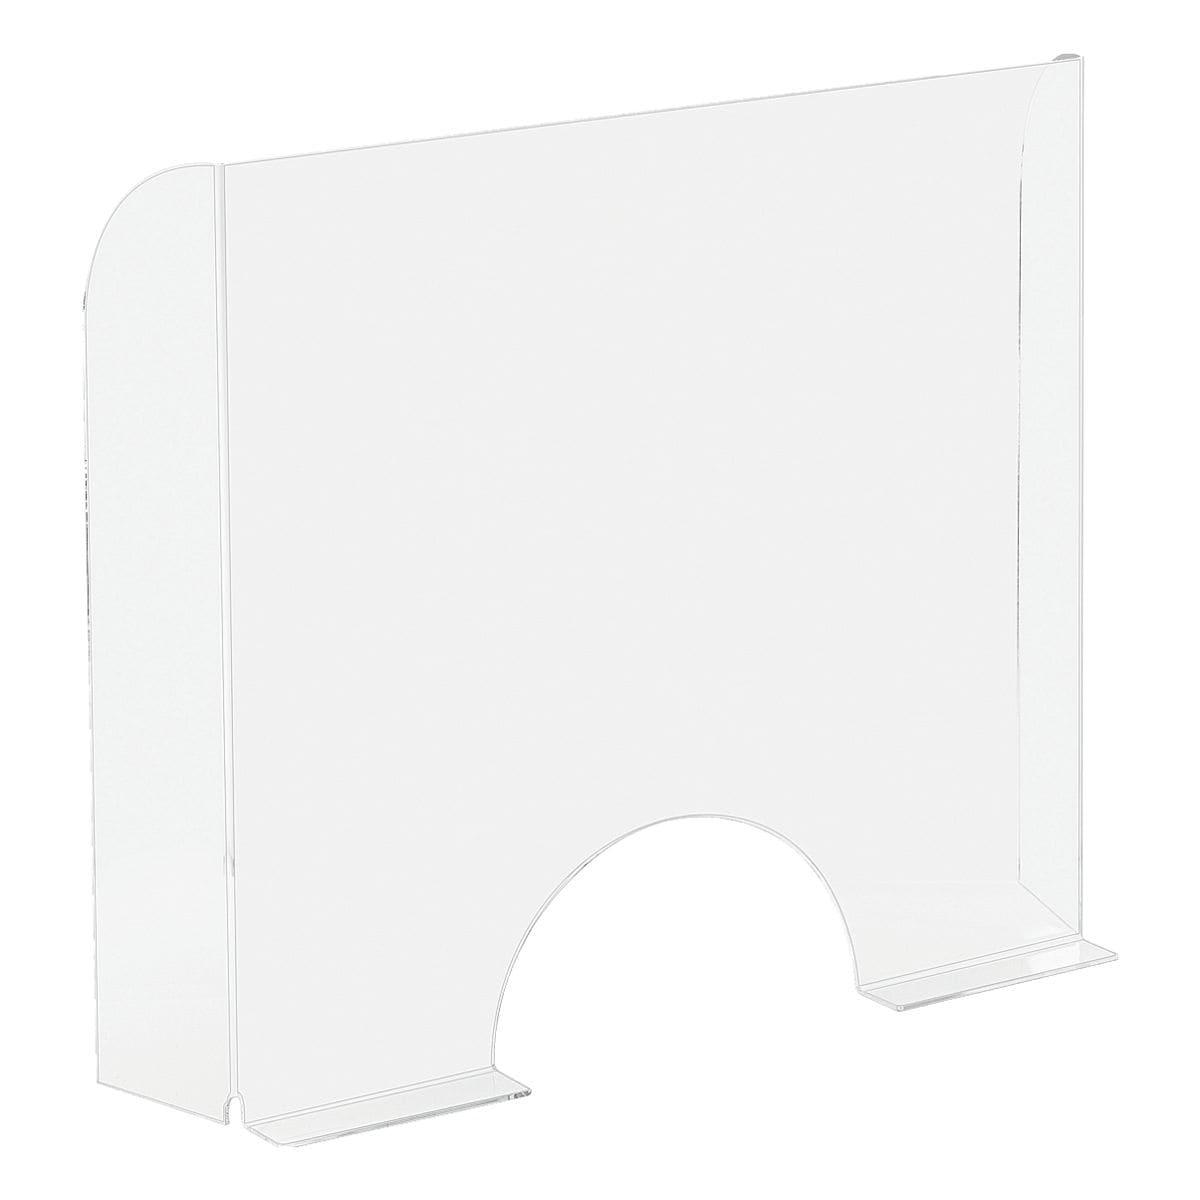 EXACOMPTA Nies- und Spuckschutz / Trennwand »Exascreen« 68 x 6 x 95 cm